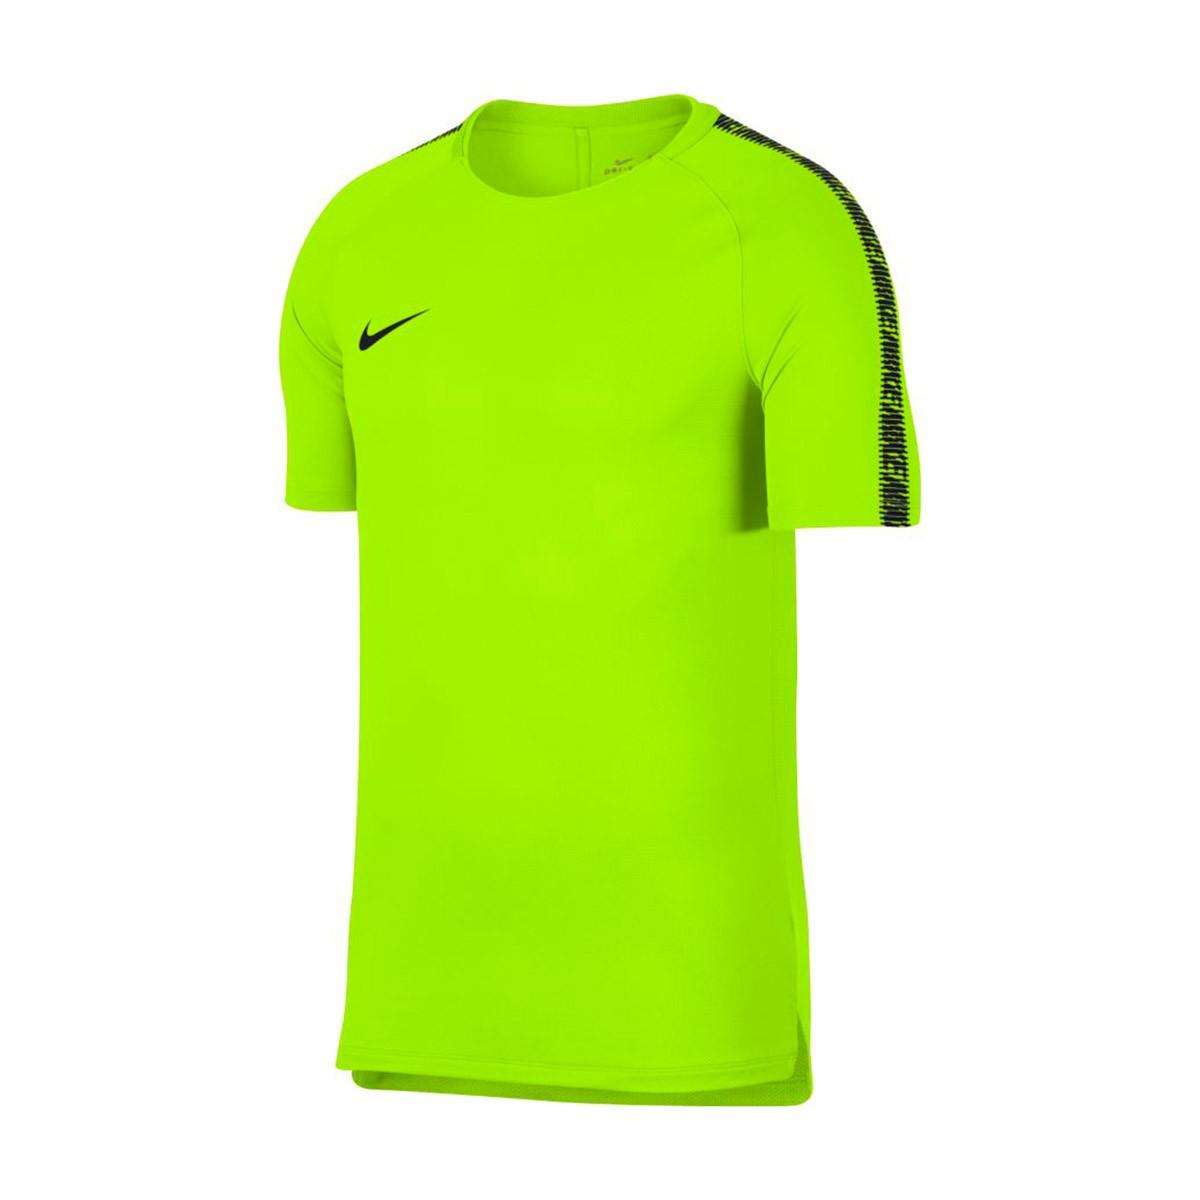 924aee5eecb Playera Nike Breathe Squad Top SS Neymar Volt-Black - Tienda de fútbol  Fútbol Emotion